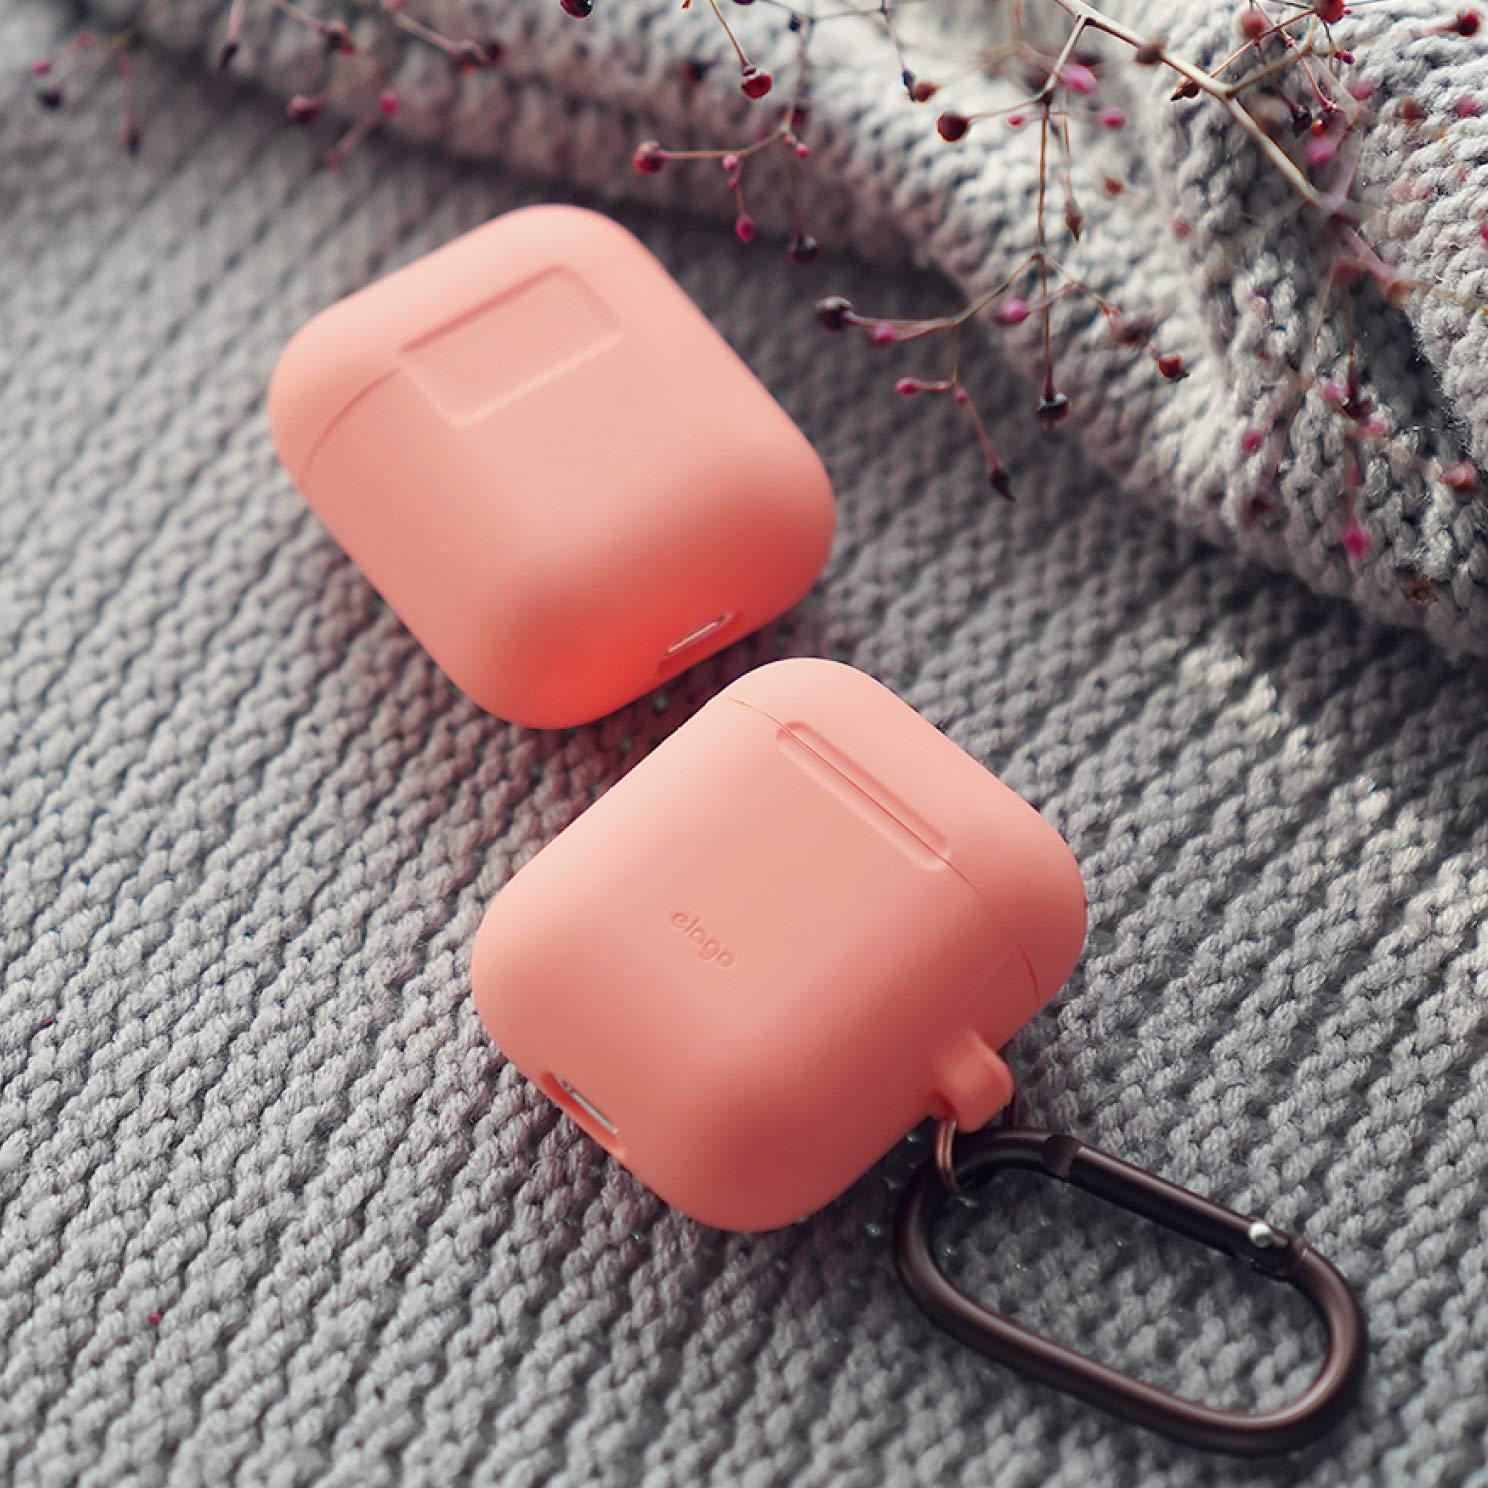 Black Square Adjustable Flue Steel Mesh Bolt-on Cover Chimney Cap 8 in x 8 in